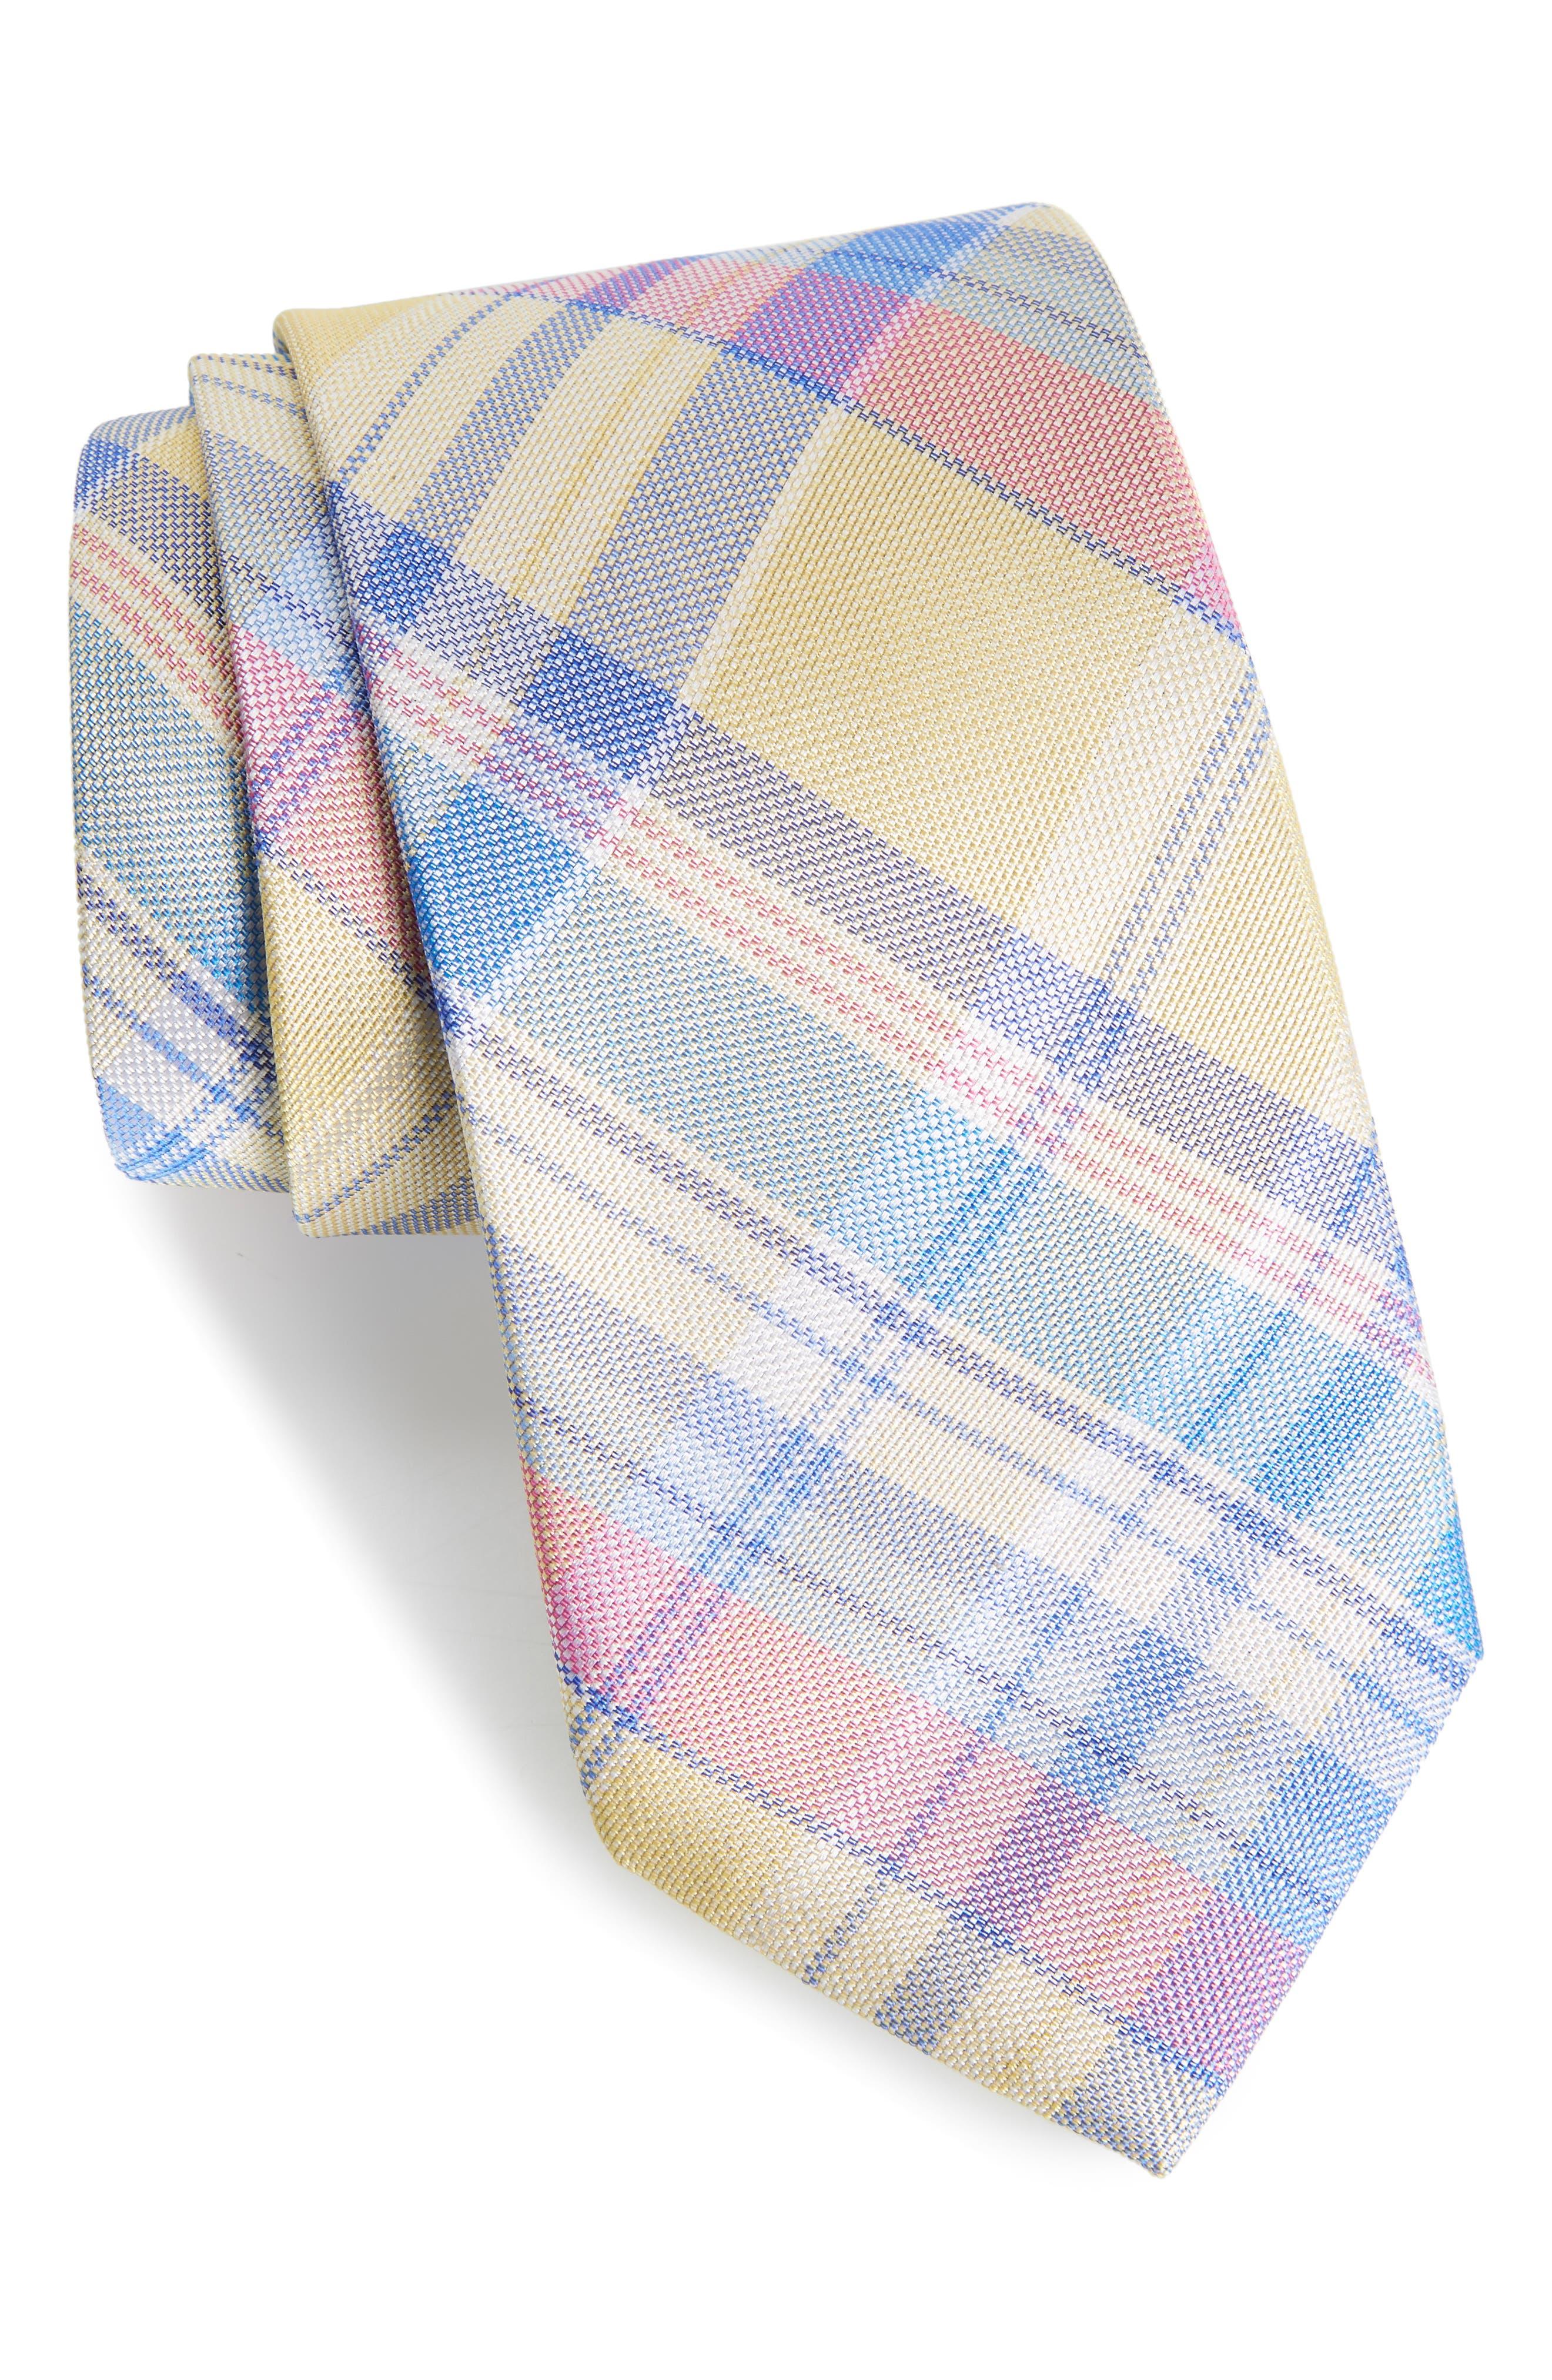 Del Rio Plaid Silk Tie,                         Main,                         color, Yellow